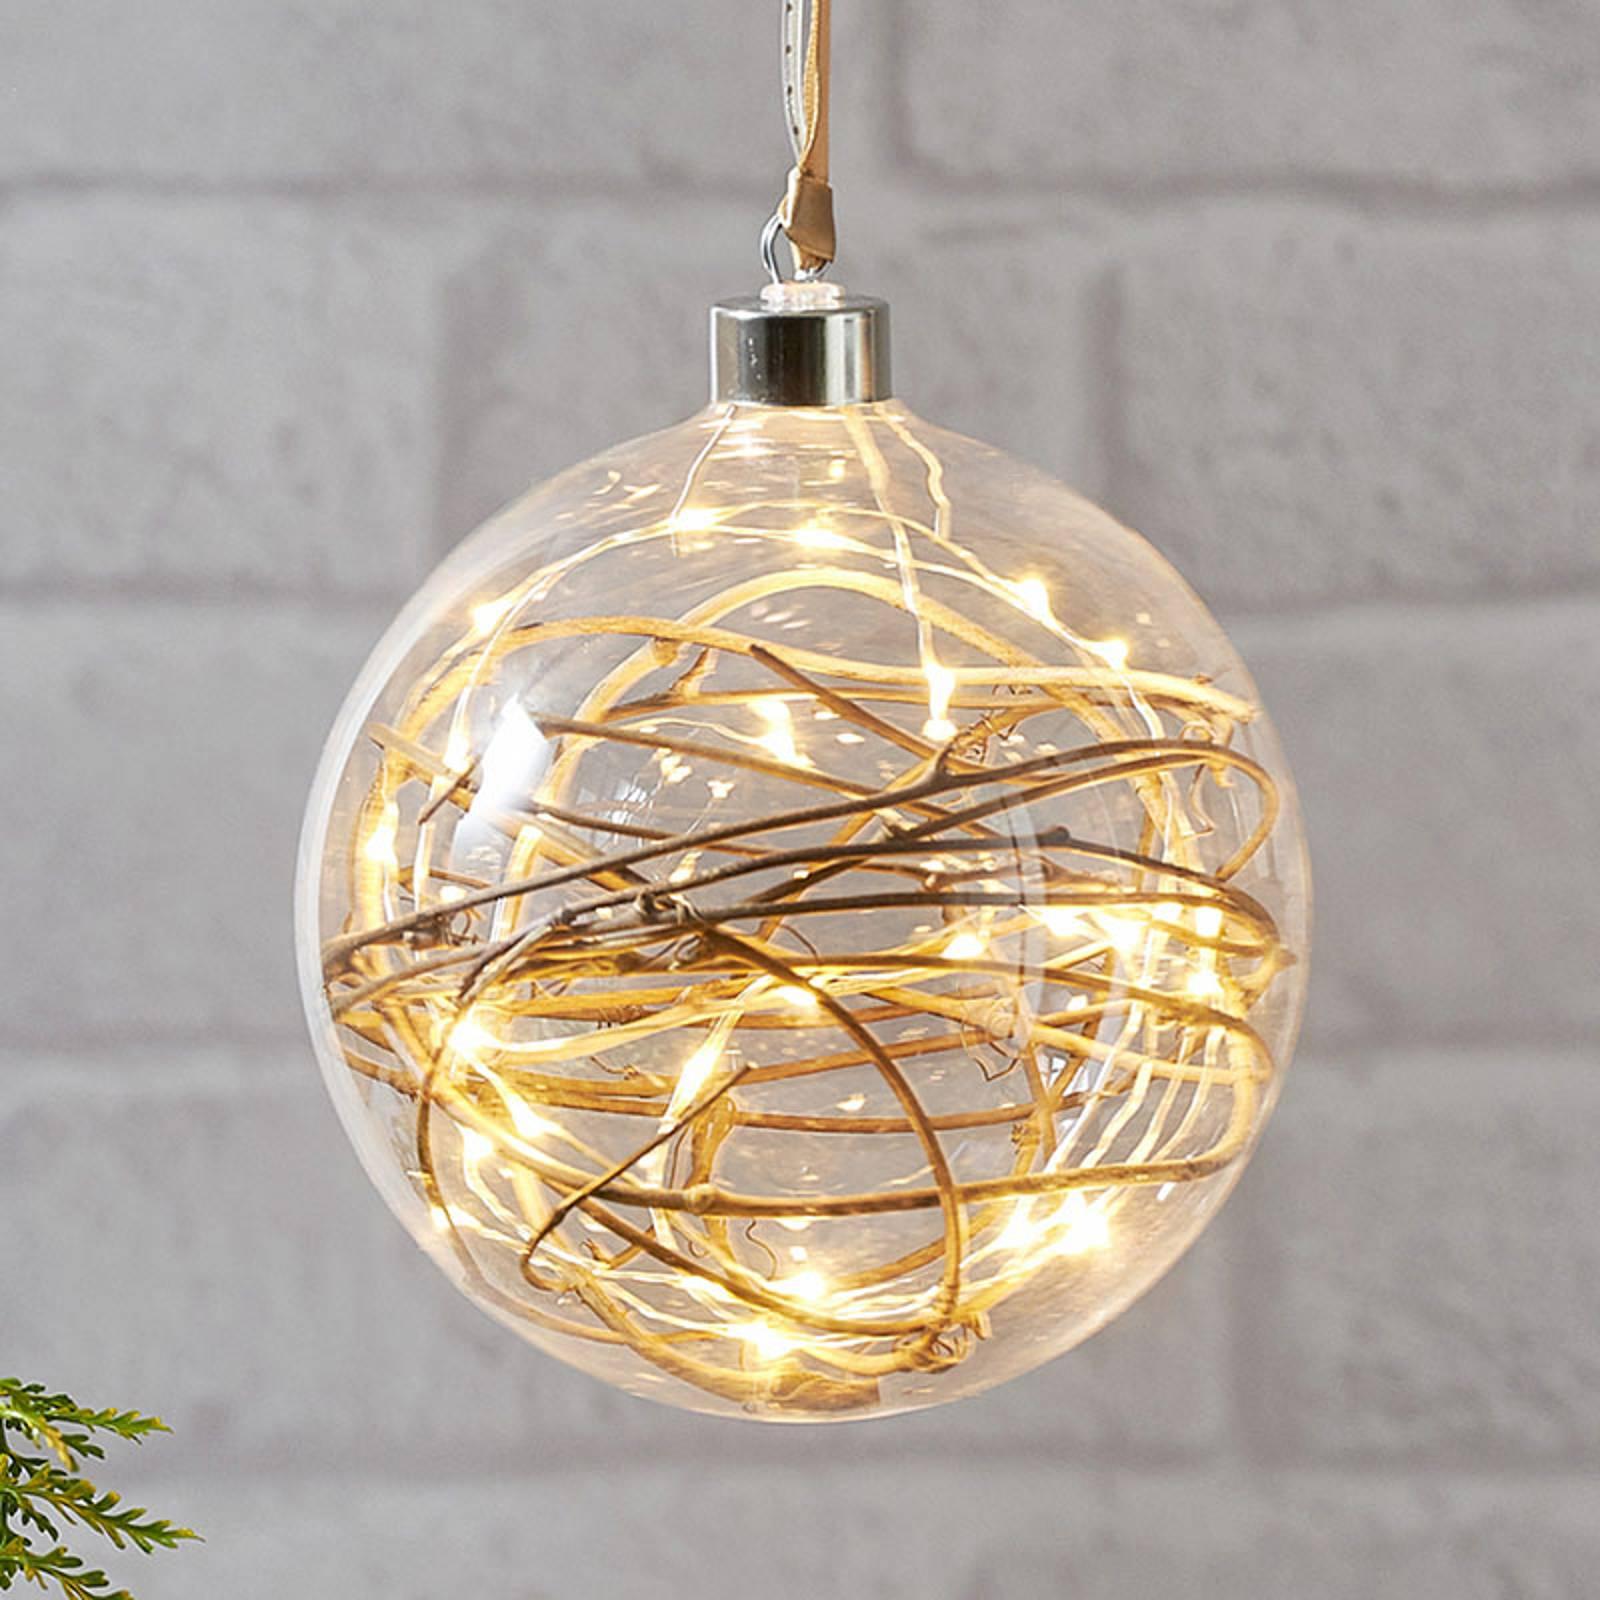 Glow-LED-koristepallo, kirkas, rottinki Ø 15 cm